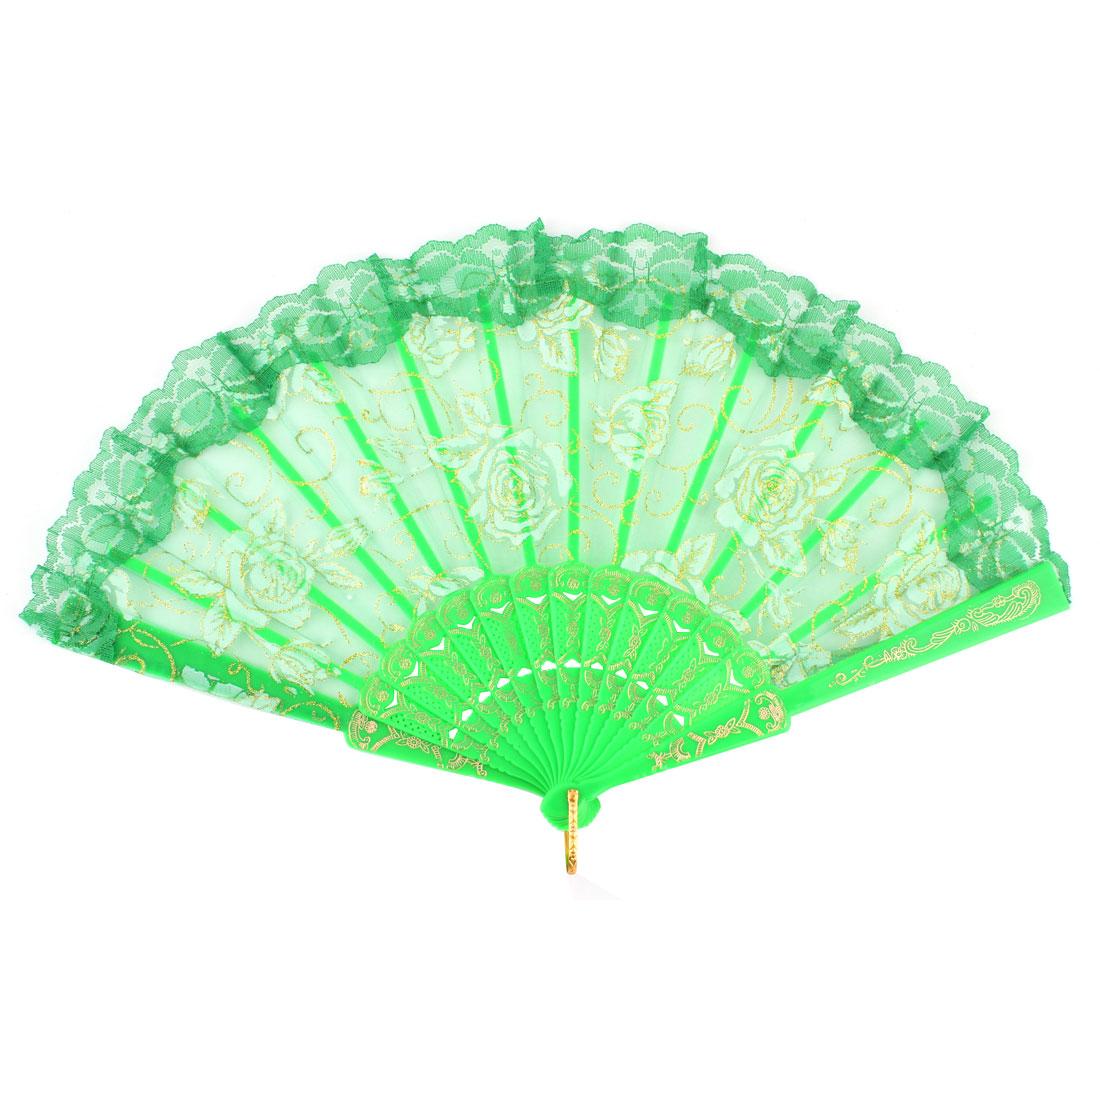 Glittery Outline Rose Pattern Lace Detail Decorative Folding Hand Fan Green